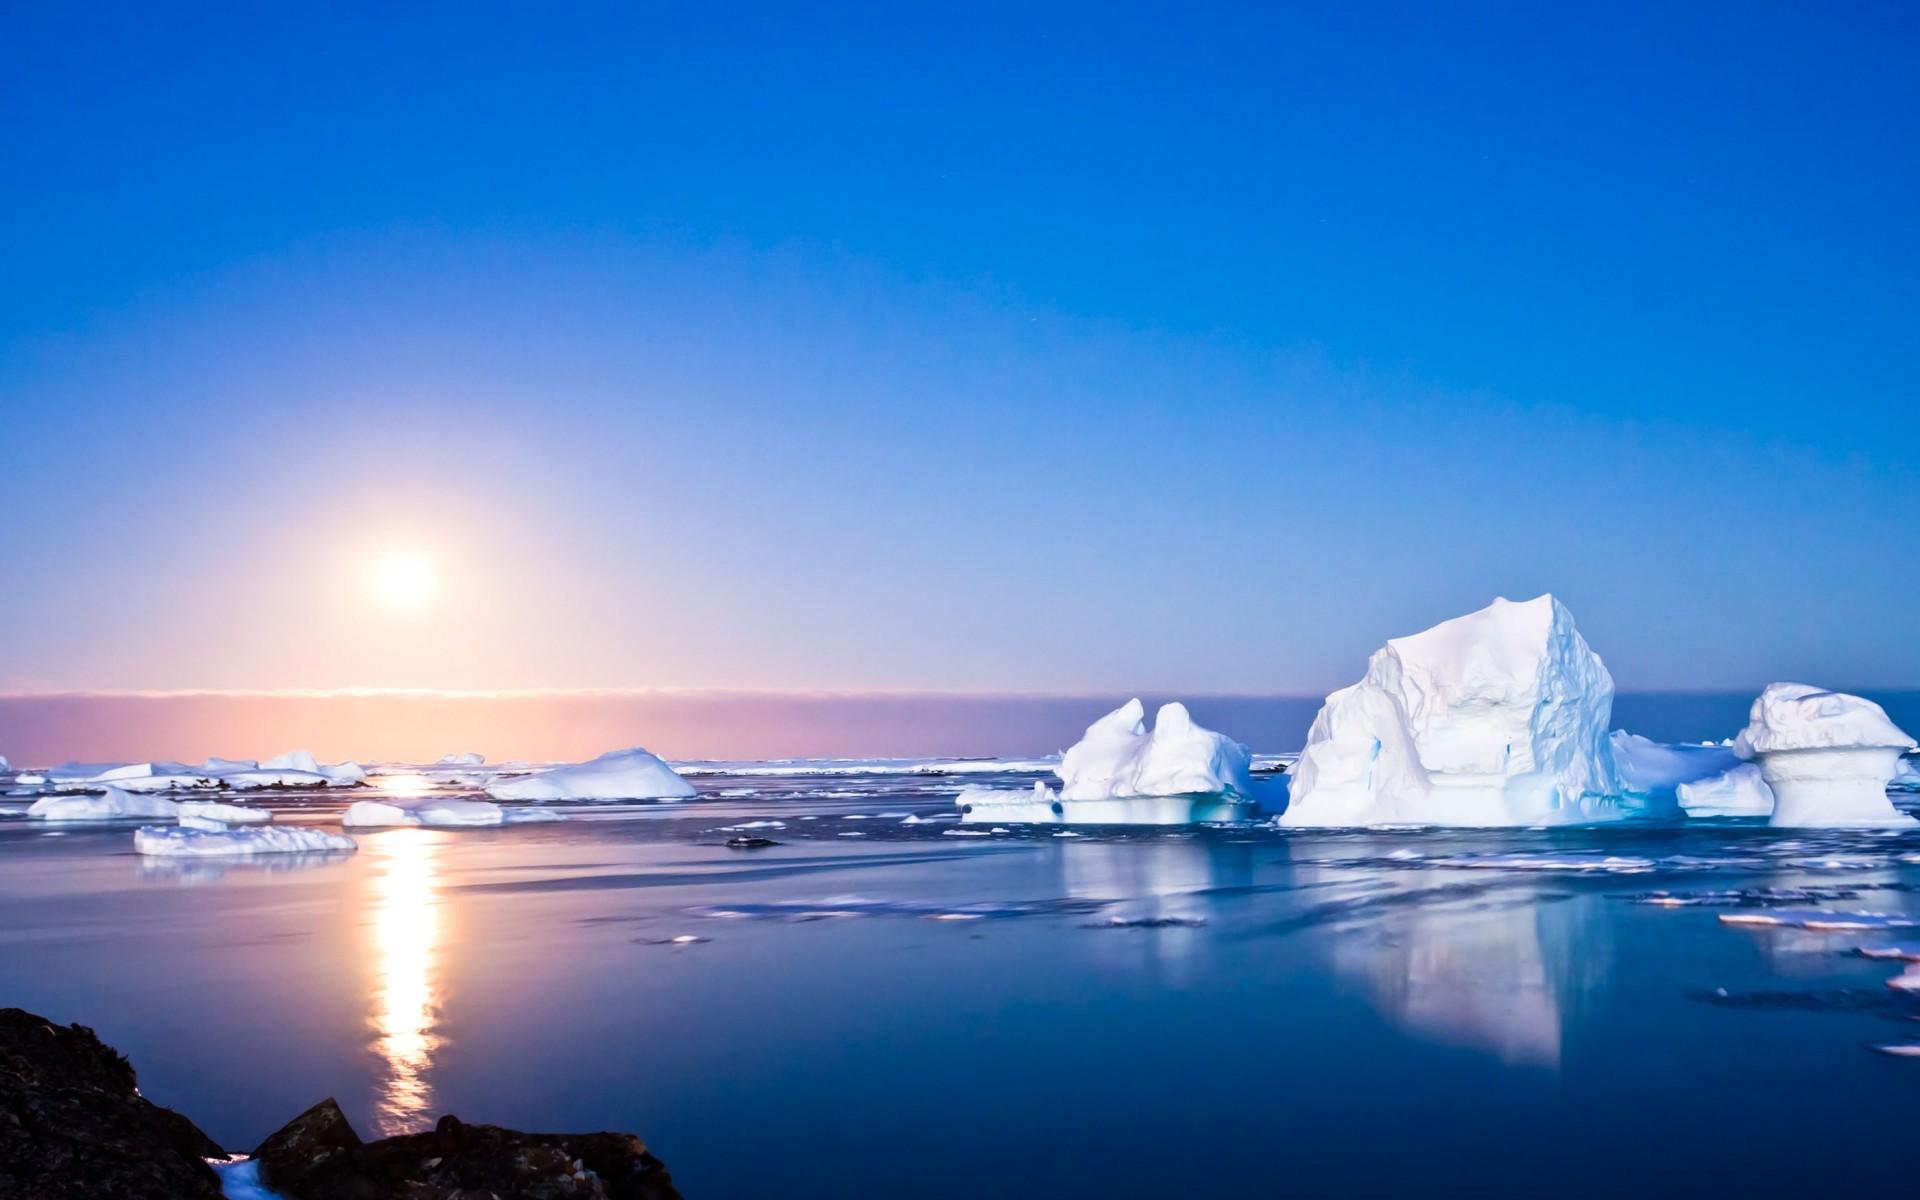 Арктика, океан, солнце